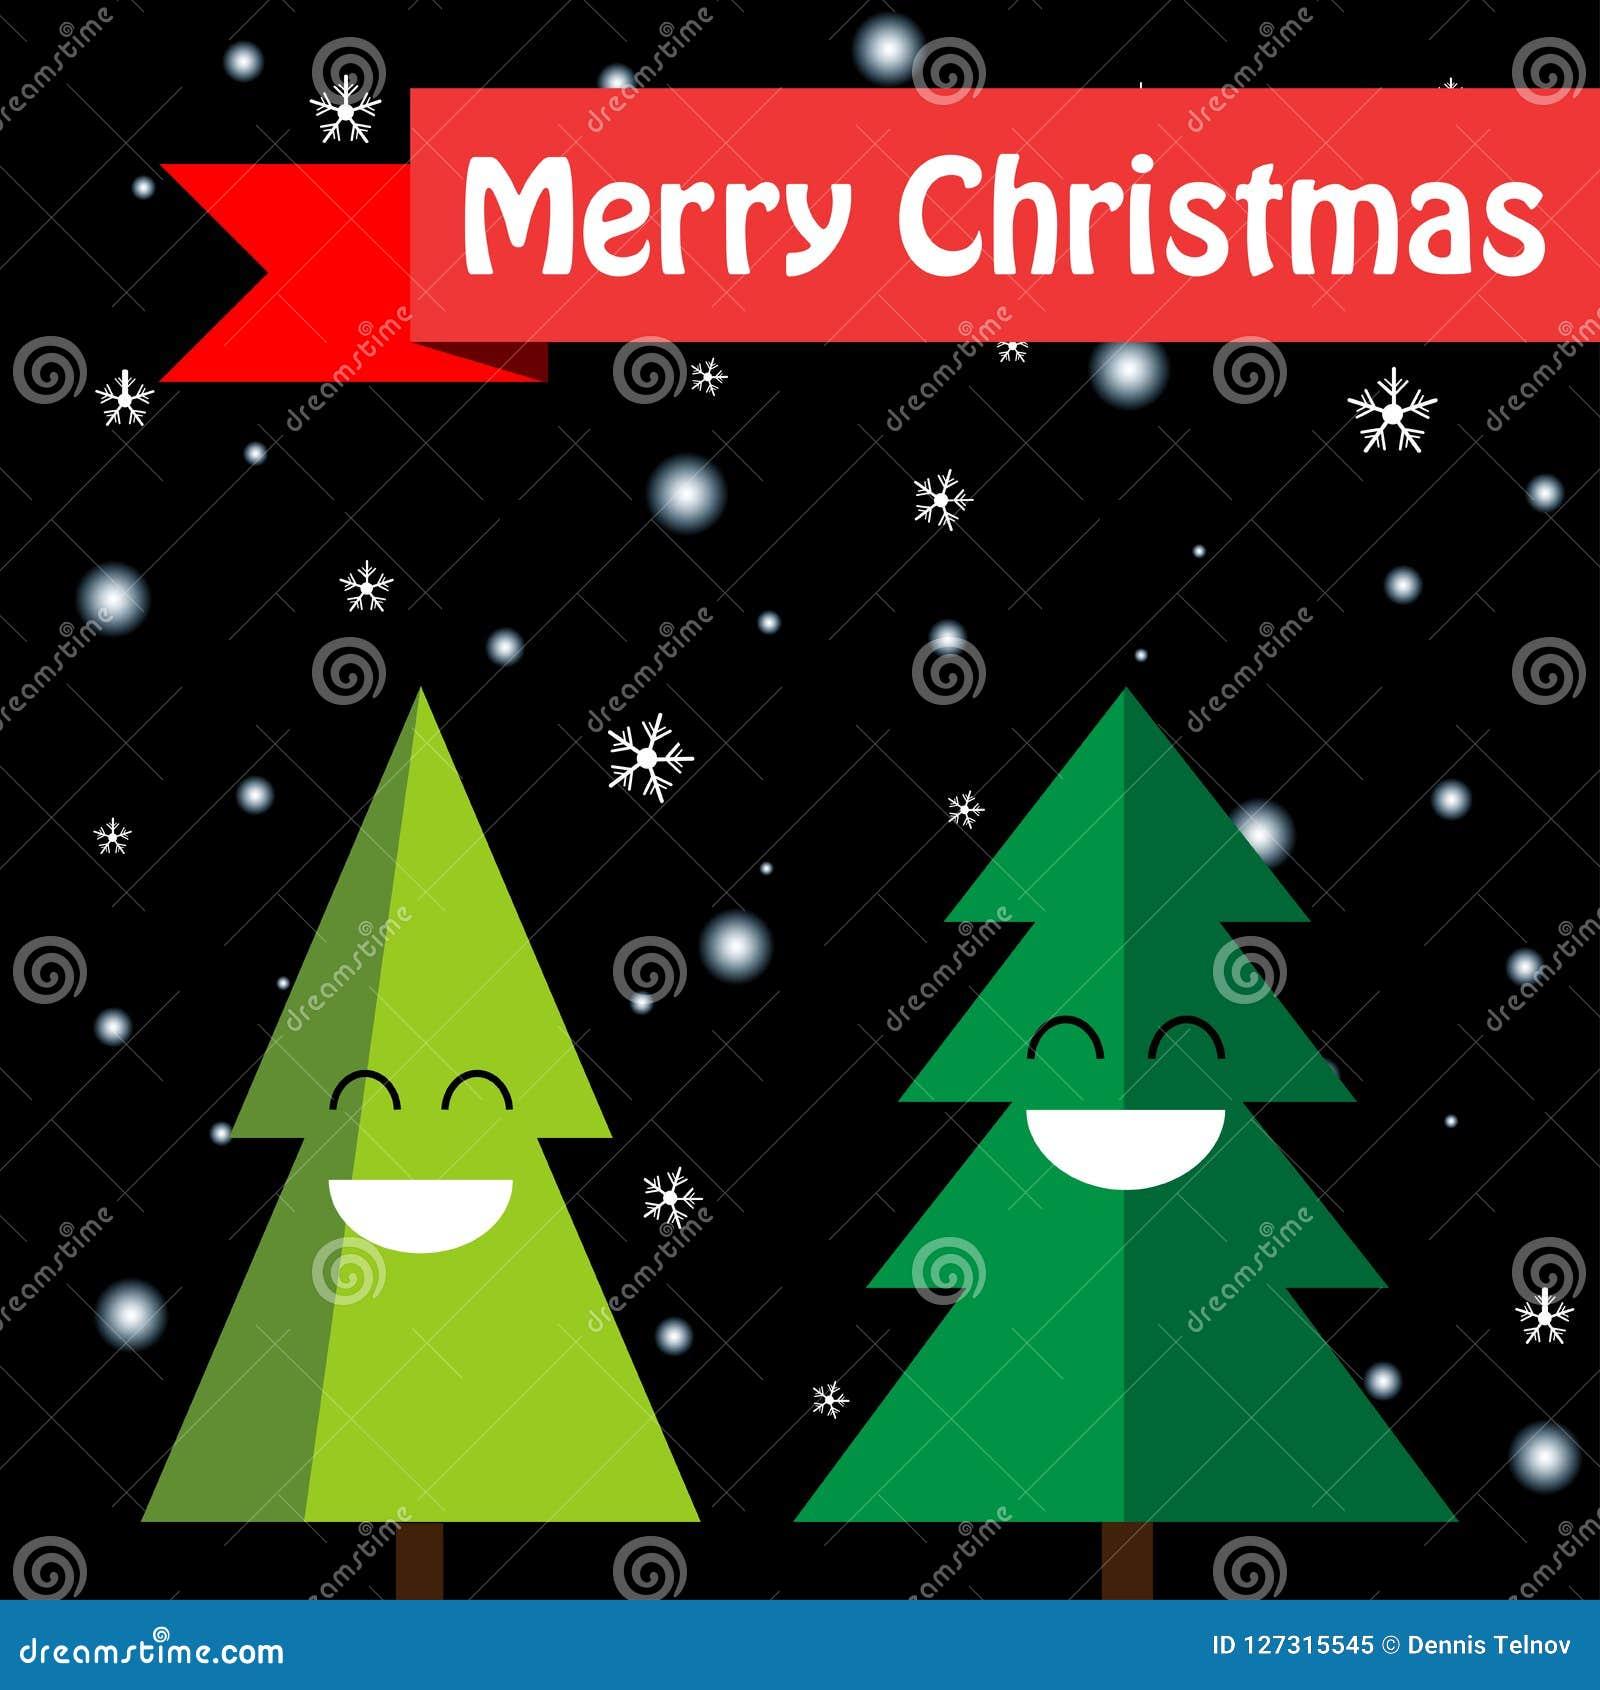 Two Joyful Christmas Trees Isolated On A Black Background. Happy ...